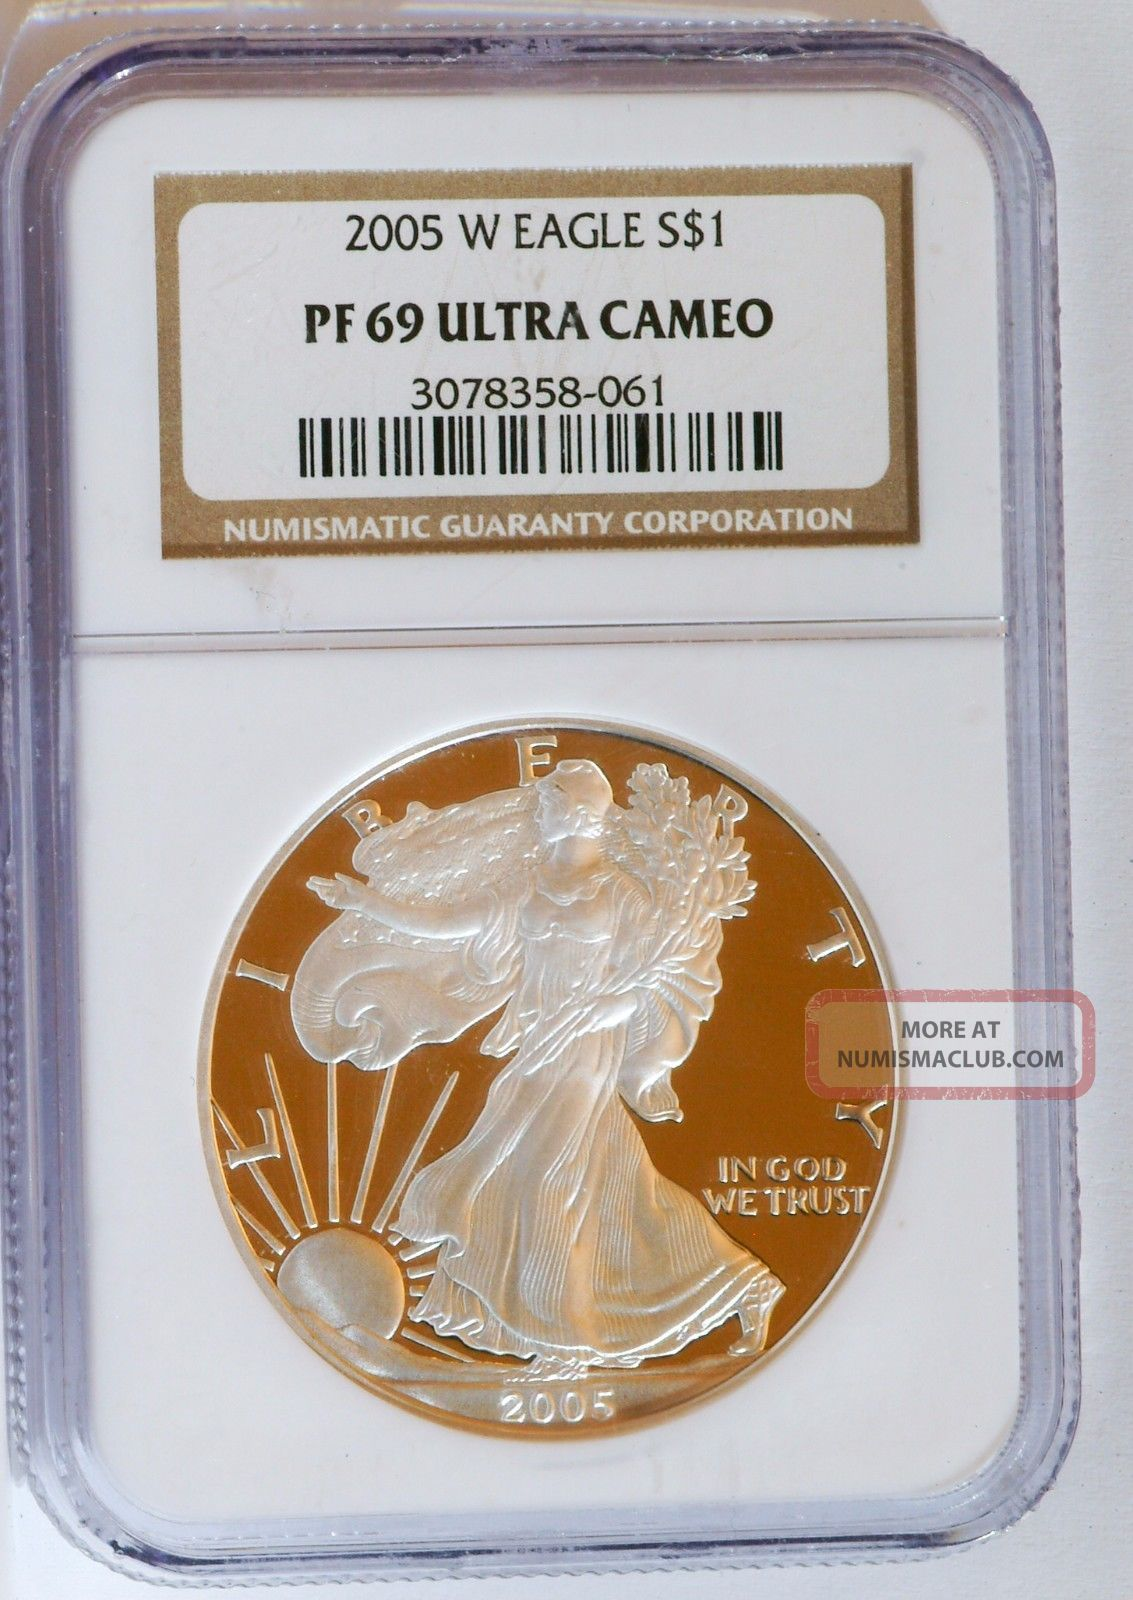 2005 W American Proof Silver Eagle Ngc Pf 69 Ultra Cameo 1 Oz.  999 Silver photo